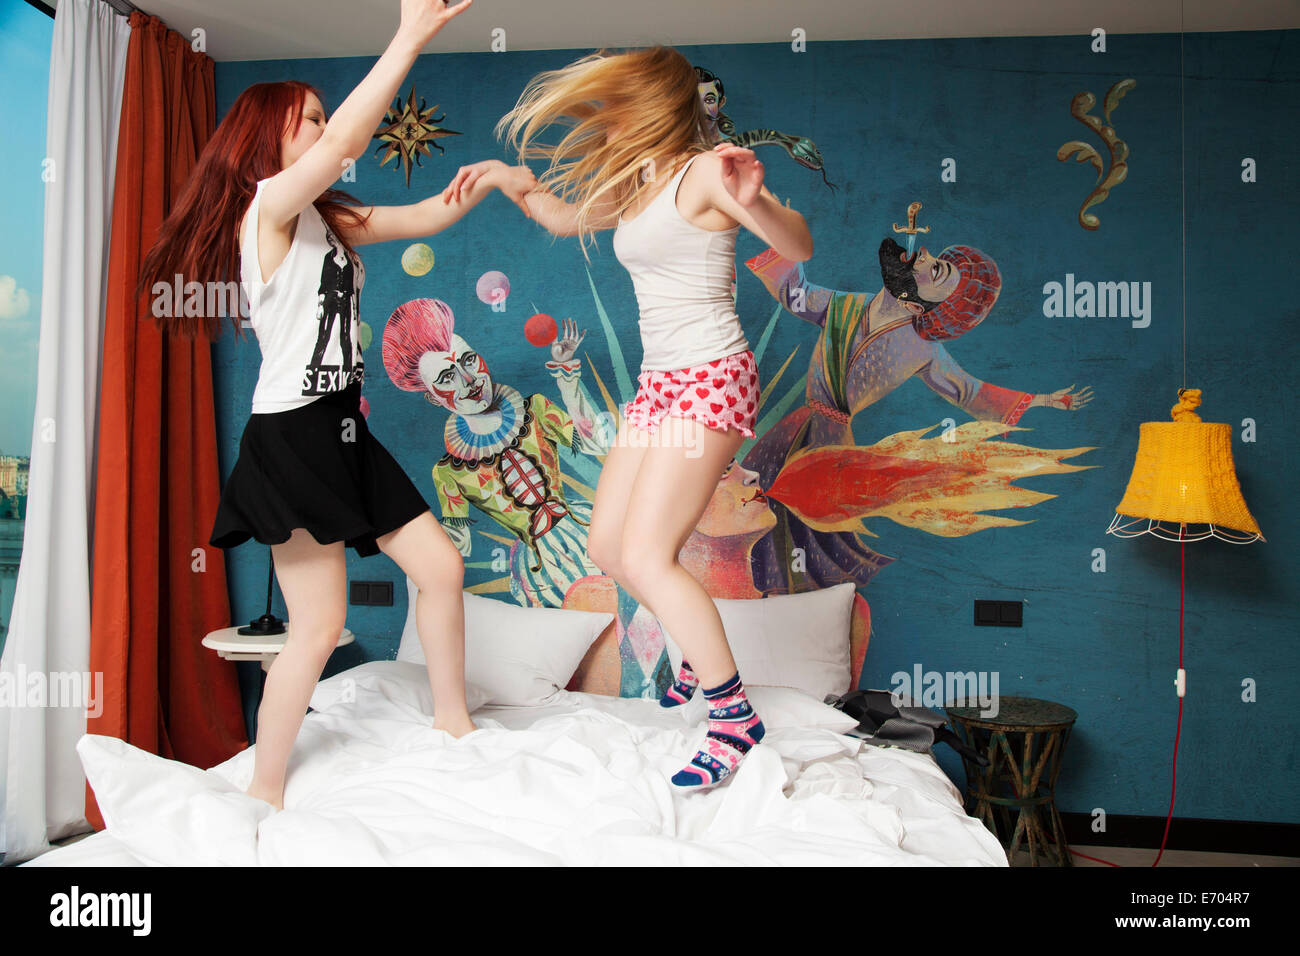 Deux jeunes femmes dancing on hotel bed Banque D'Images